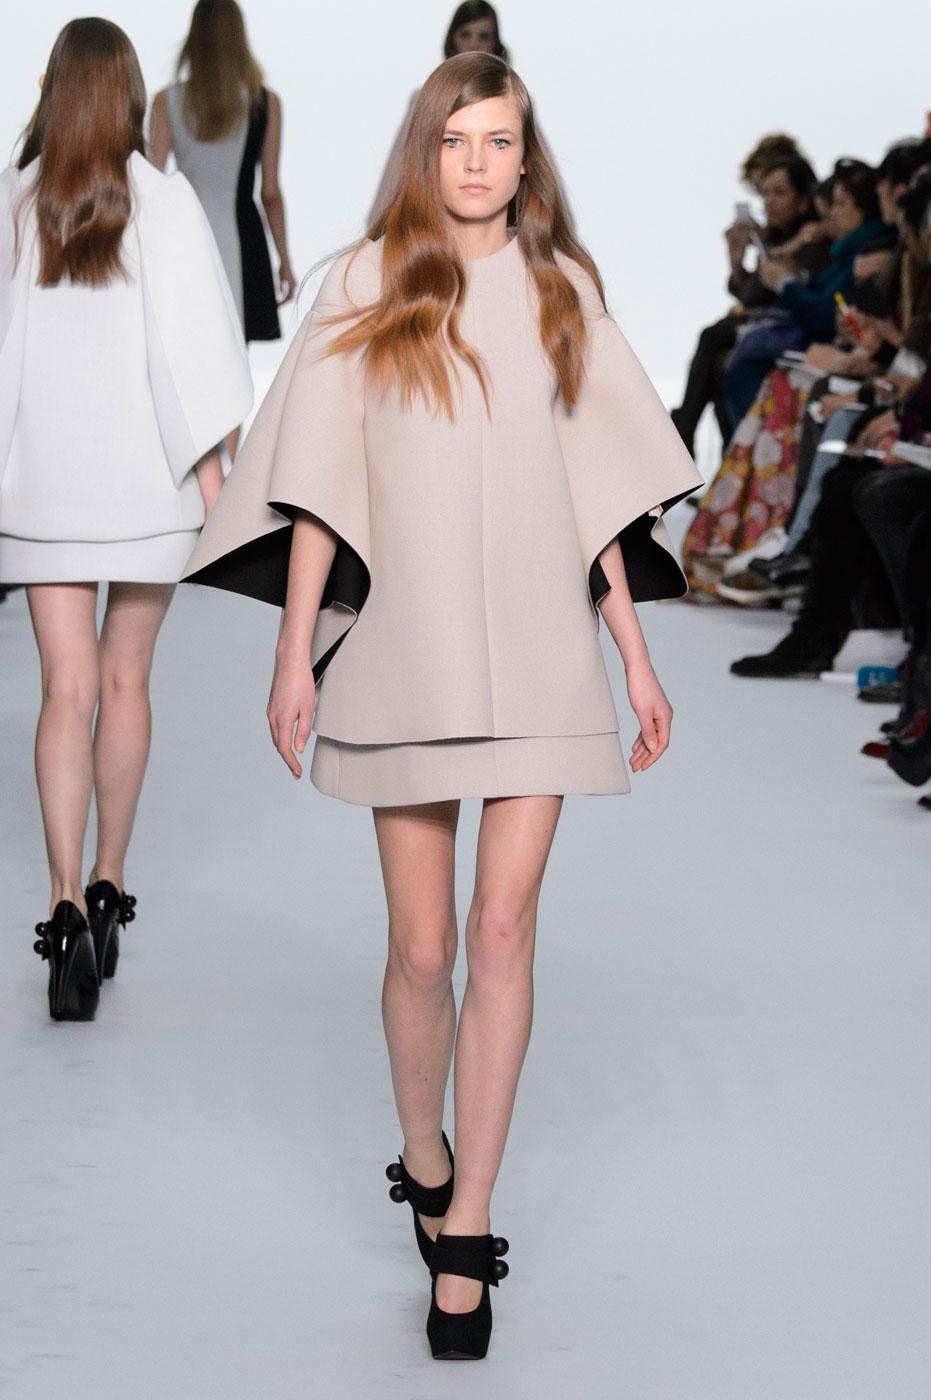 Kayek-fashion-runway-show-haute-couture-paris-spring-summer-2015-the-impression-19